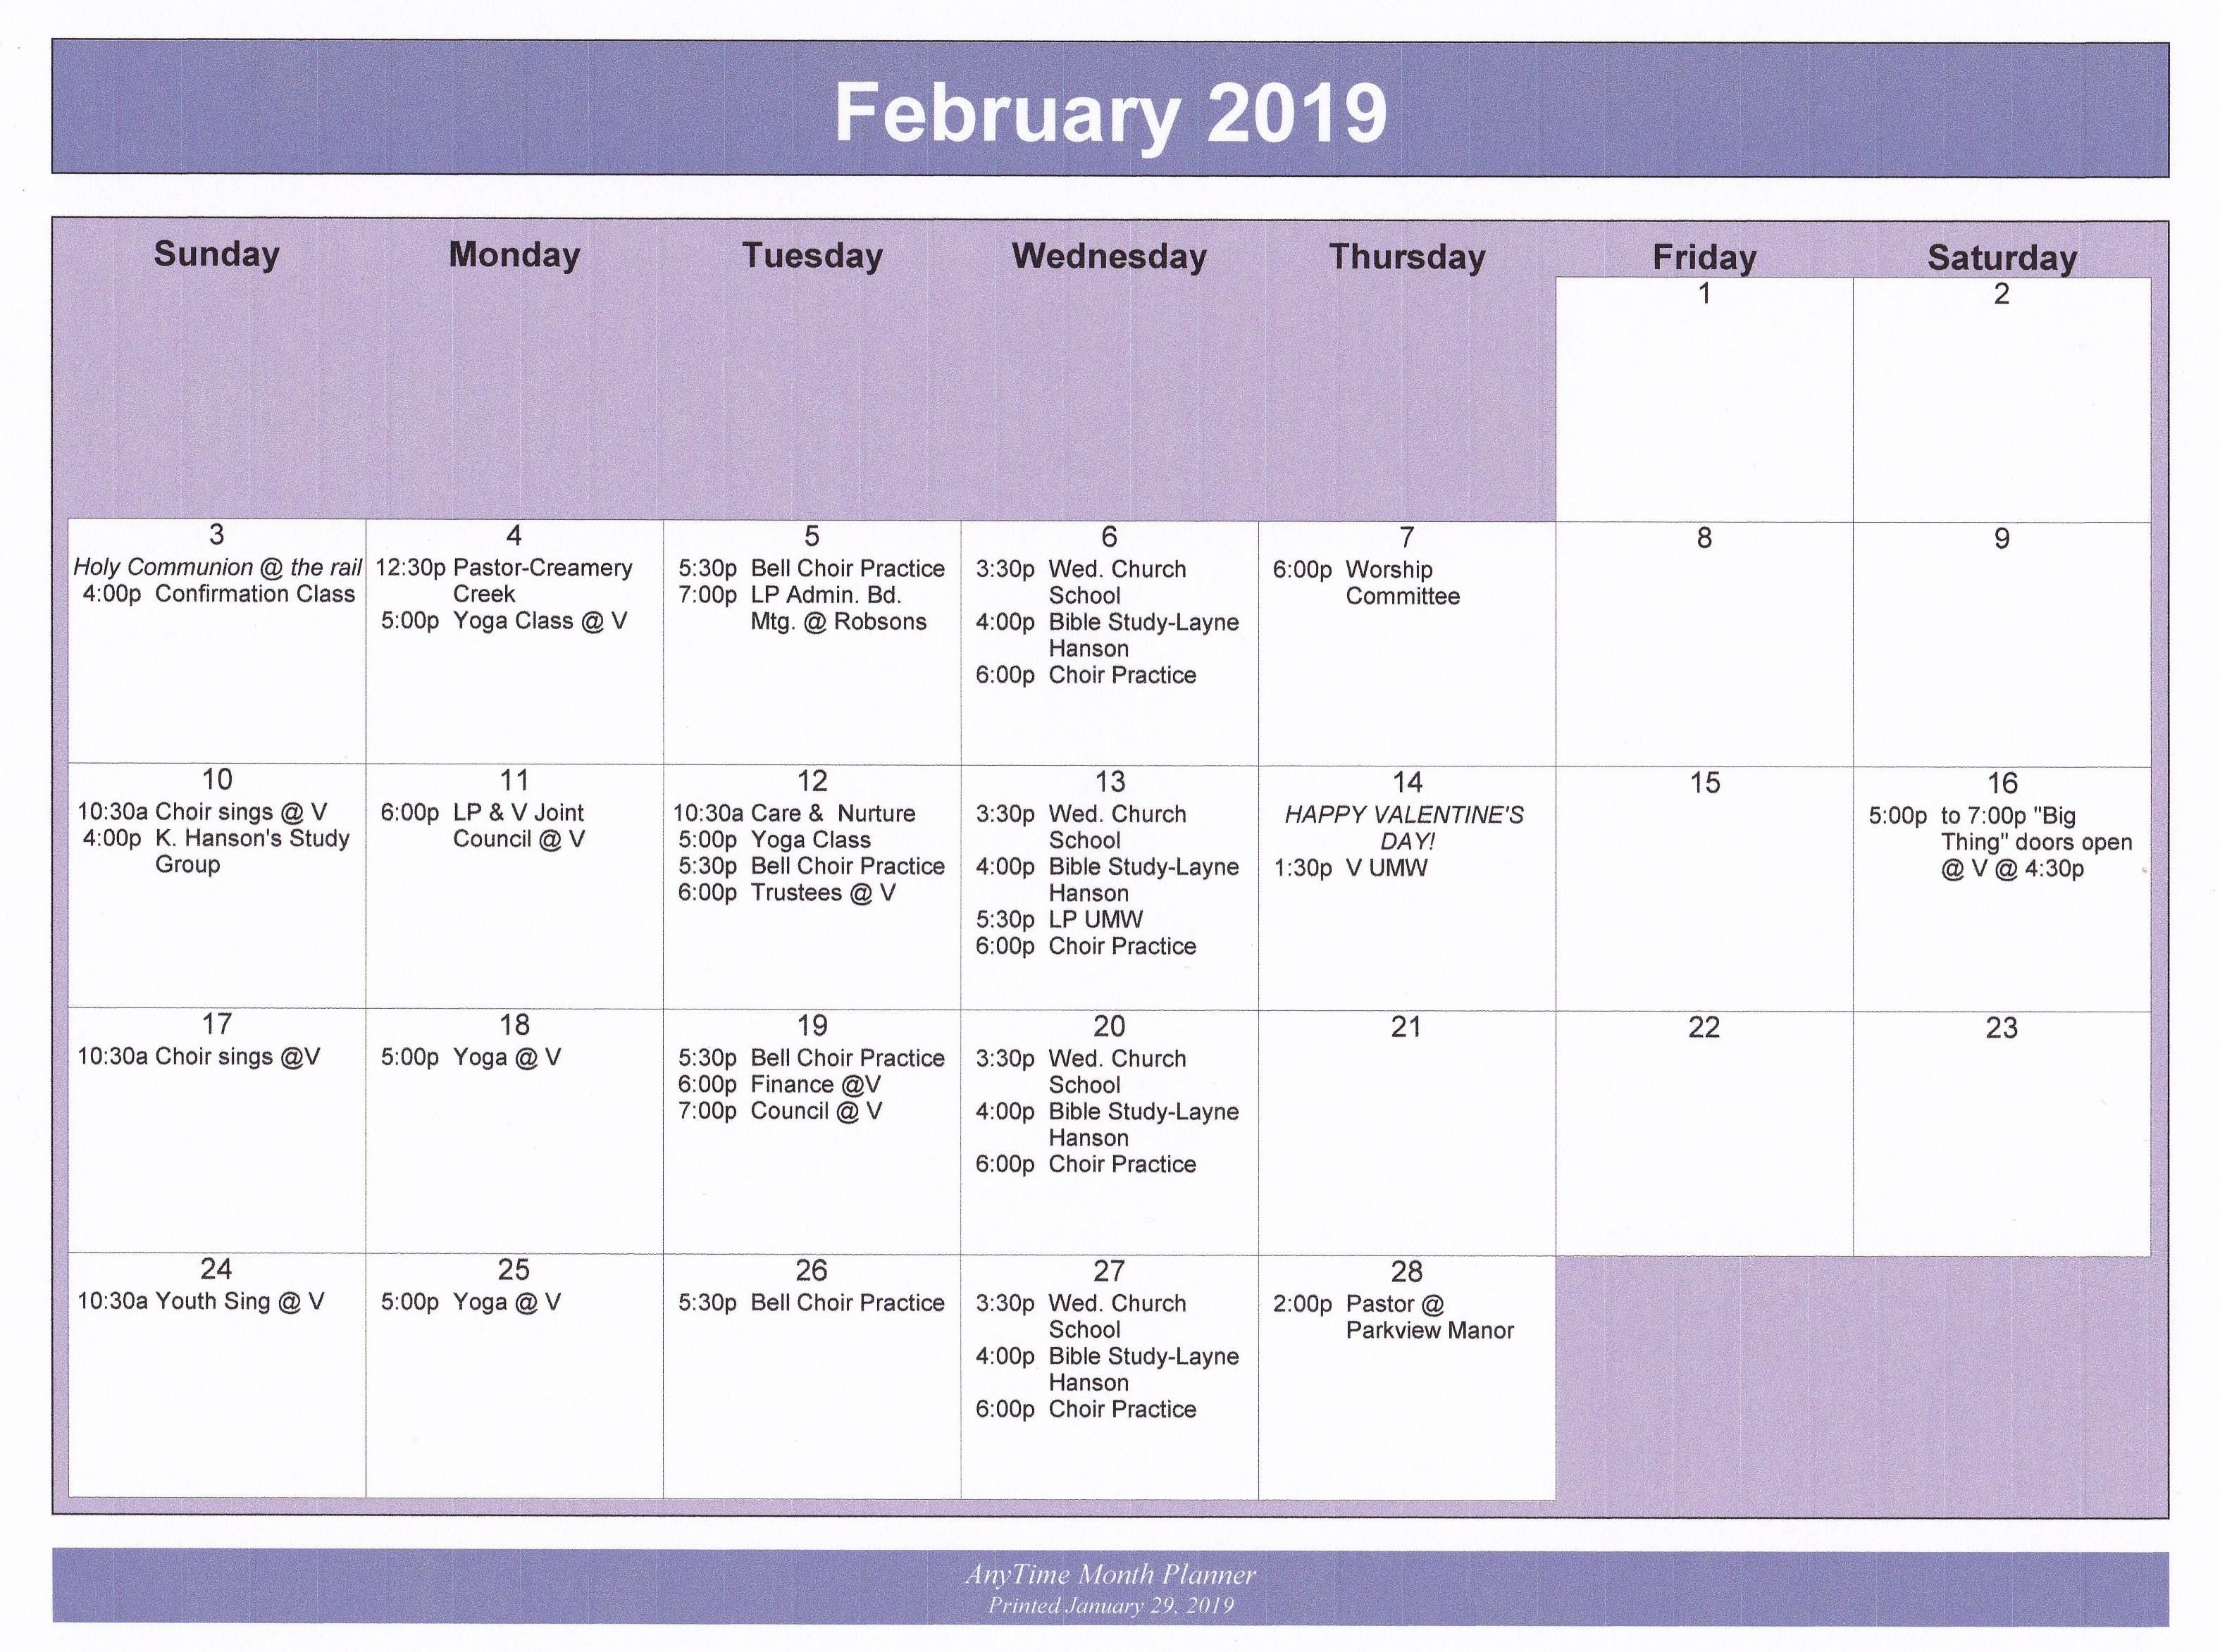 Calendar Feb 2019.Feb 2019 Calendar Liberty Pole And Viroqua United Methodist Churches